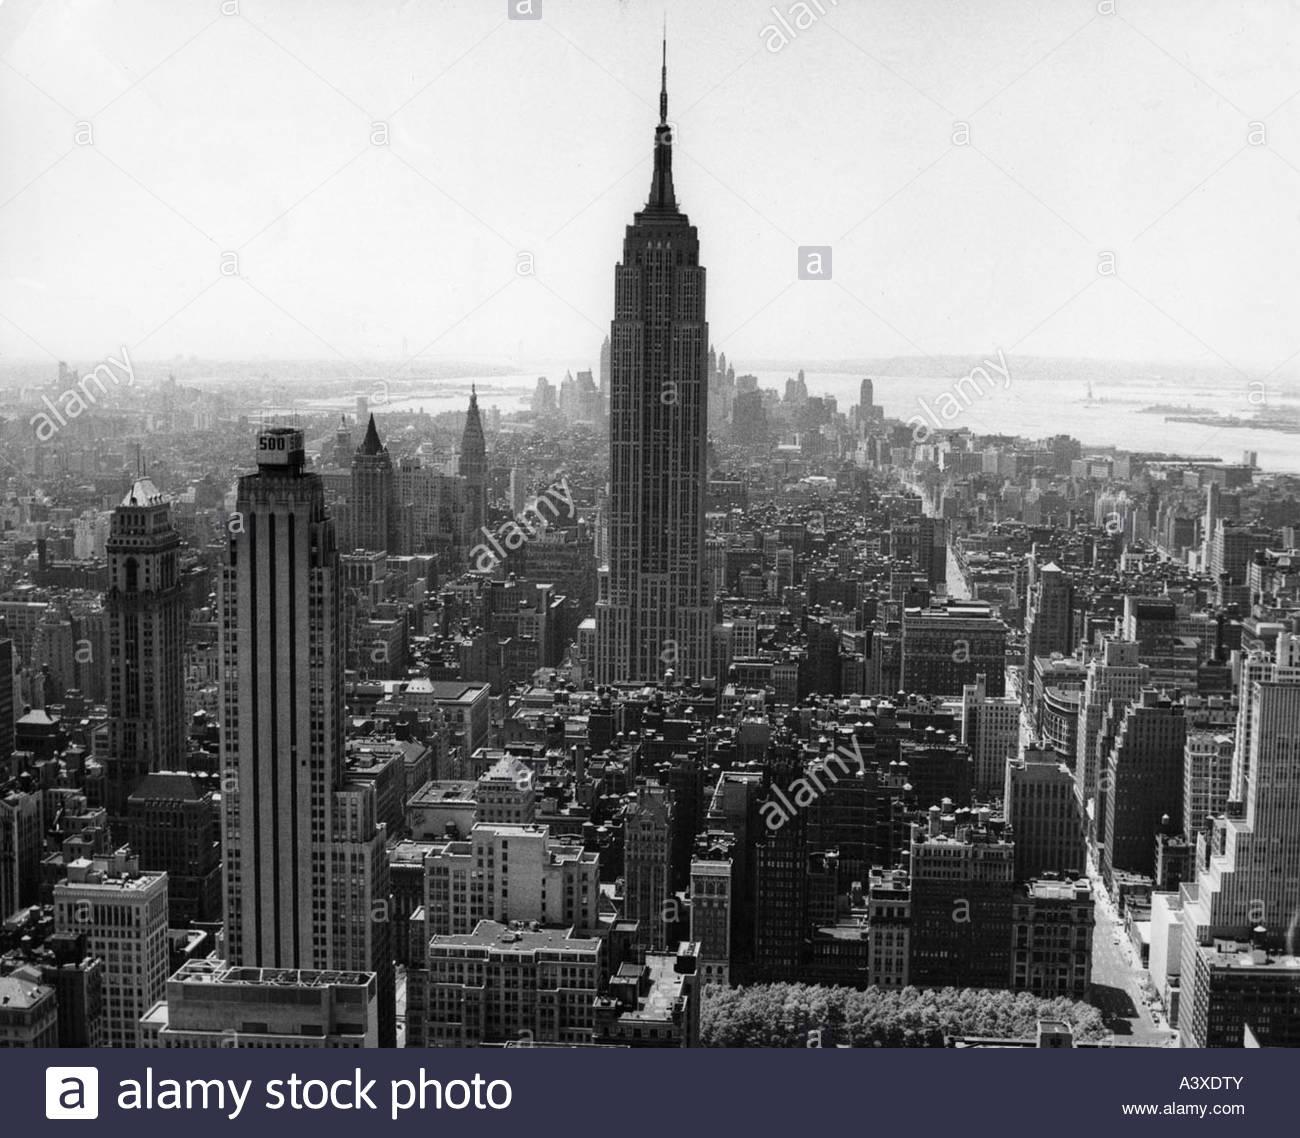 City Manhattan: New York Aerial 1950s Stock Photos & New York Aerial 1950s